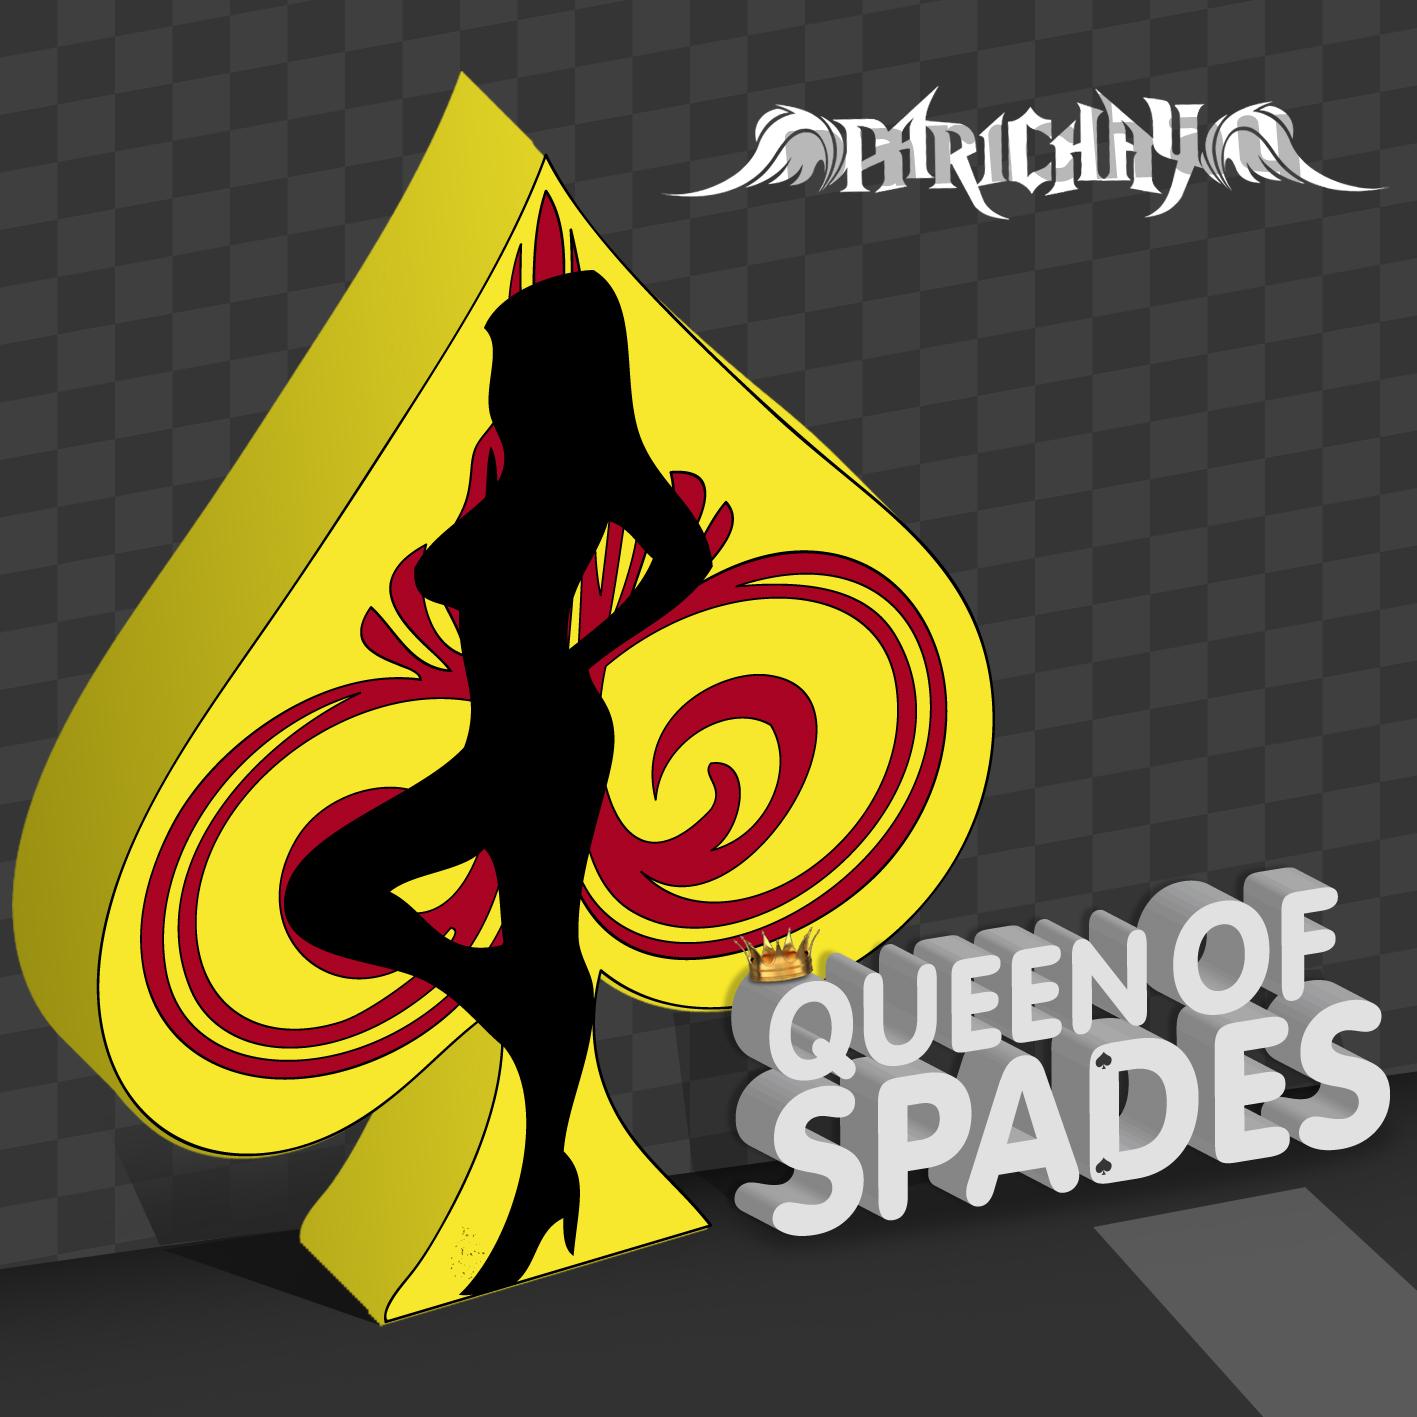 Images Of Queen Of Spades Symbol Spacehero